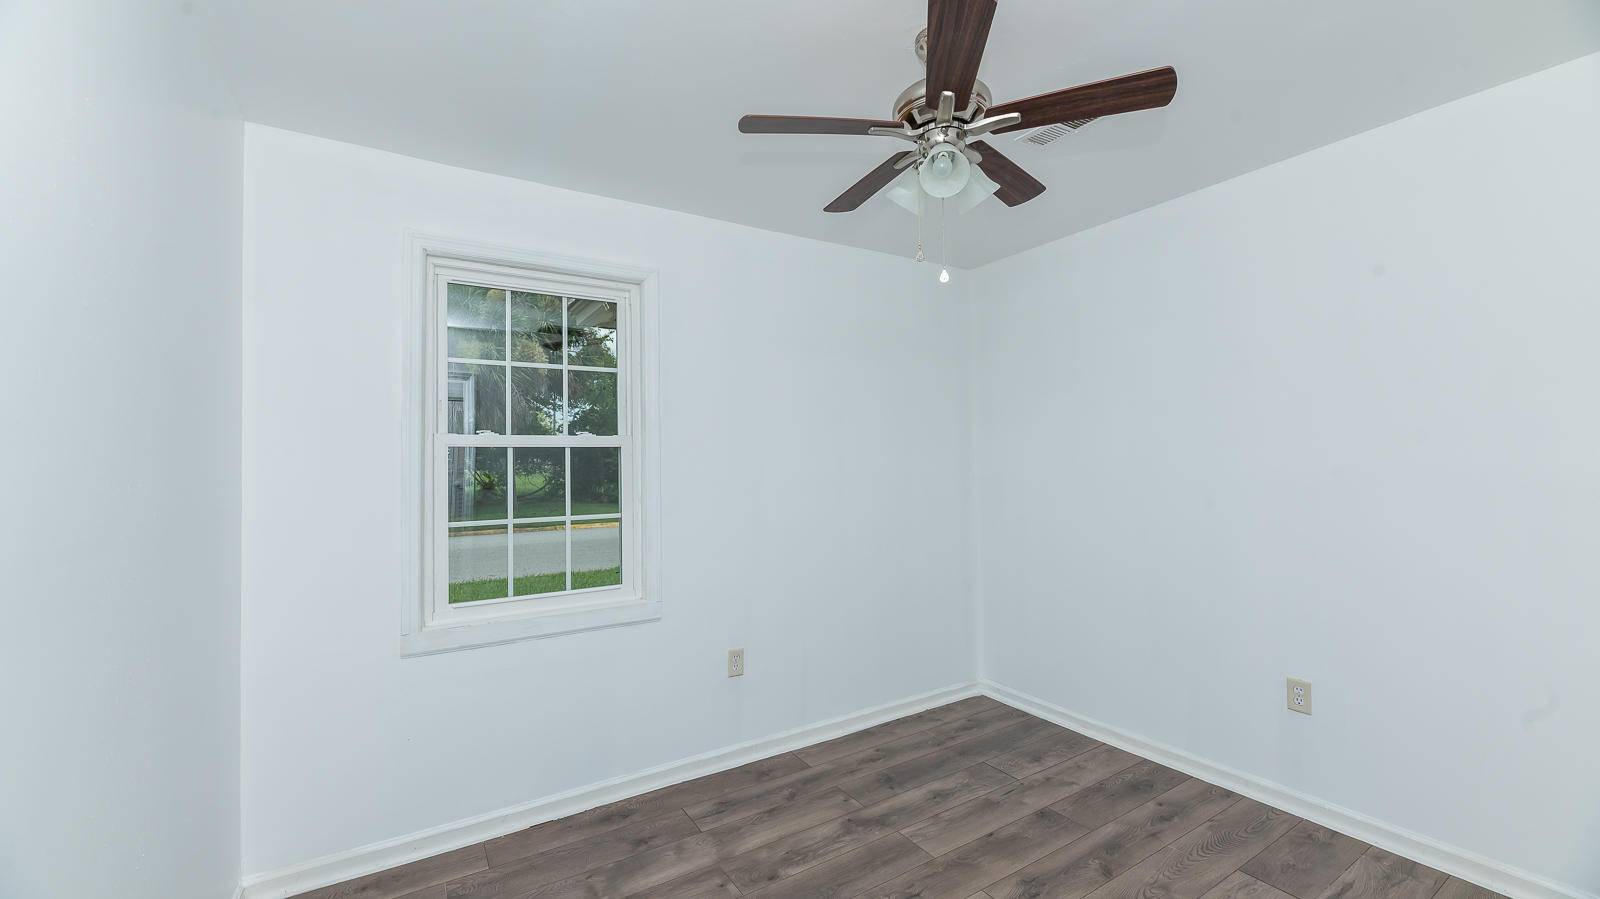 Ashley Villas Homes For Sale - 4315 Briarstone, North Charleston, SC - 16